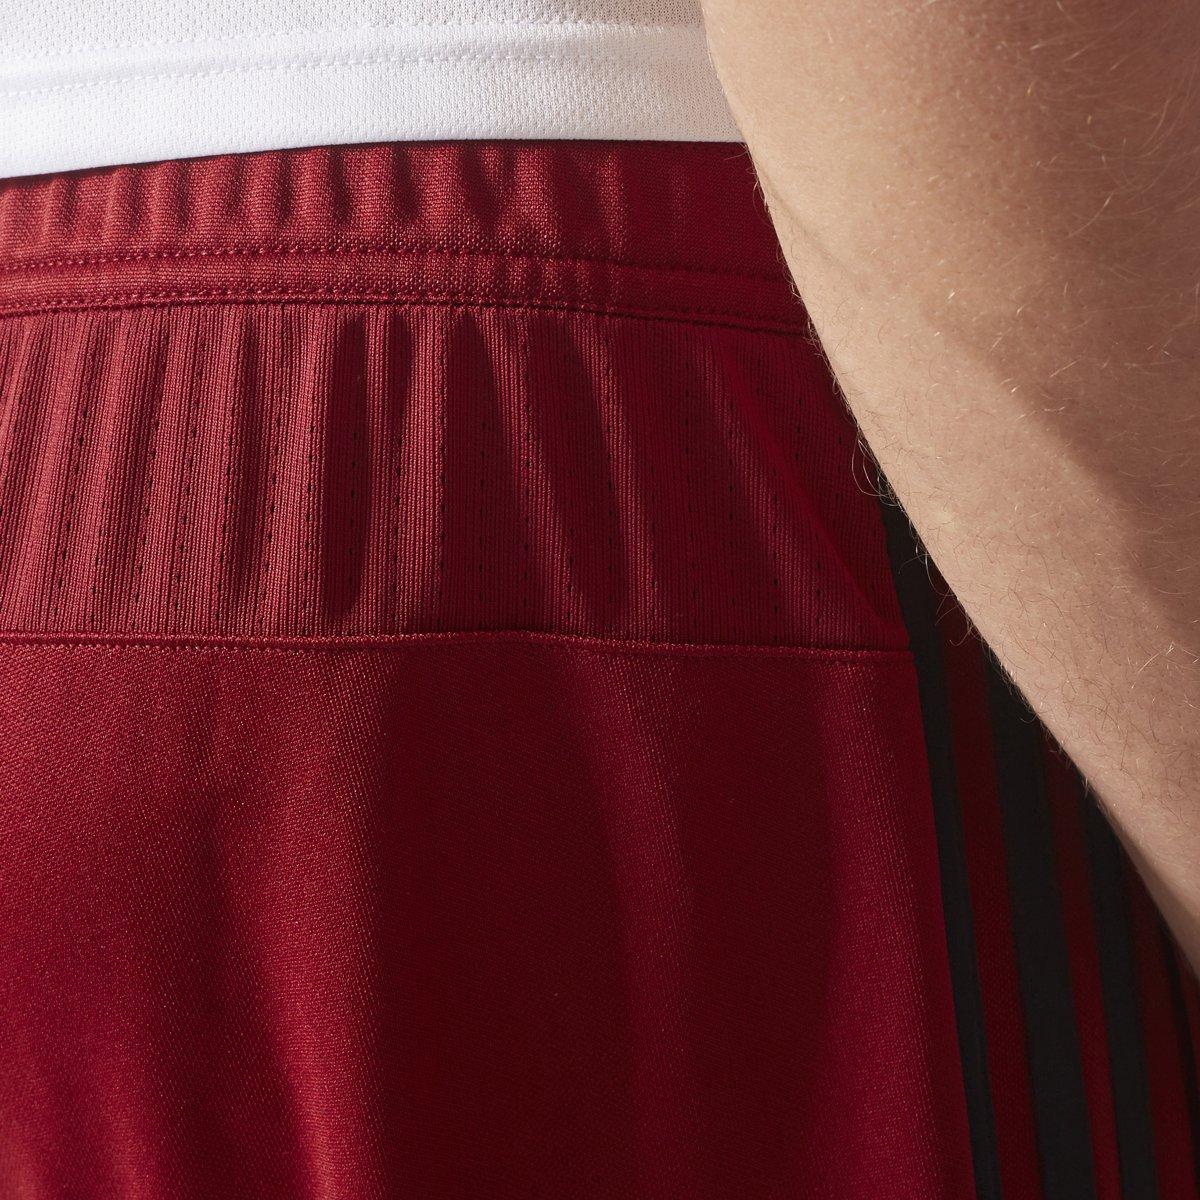 adidas Men Tiro 17 Training Pant, Collegiate Burgundy/Black, 3X-Large